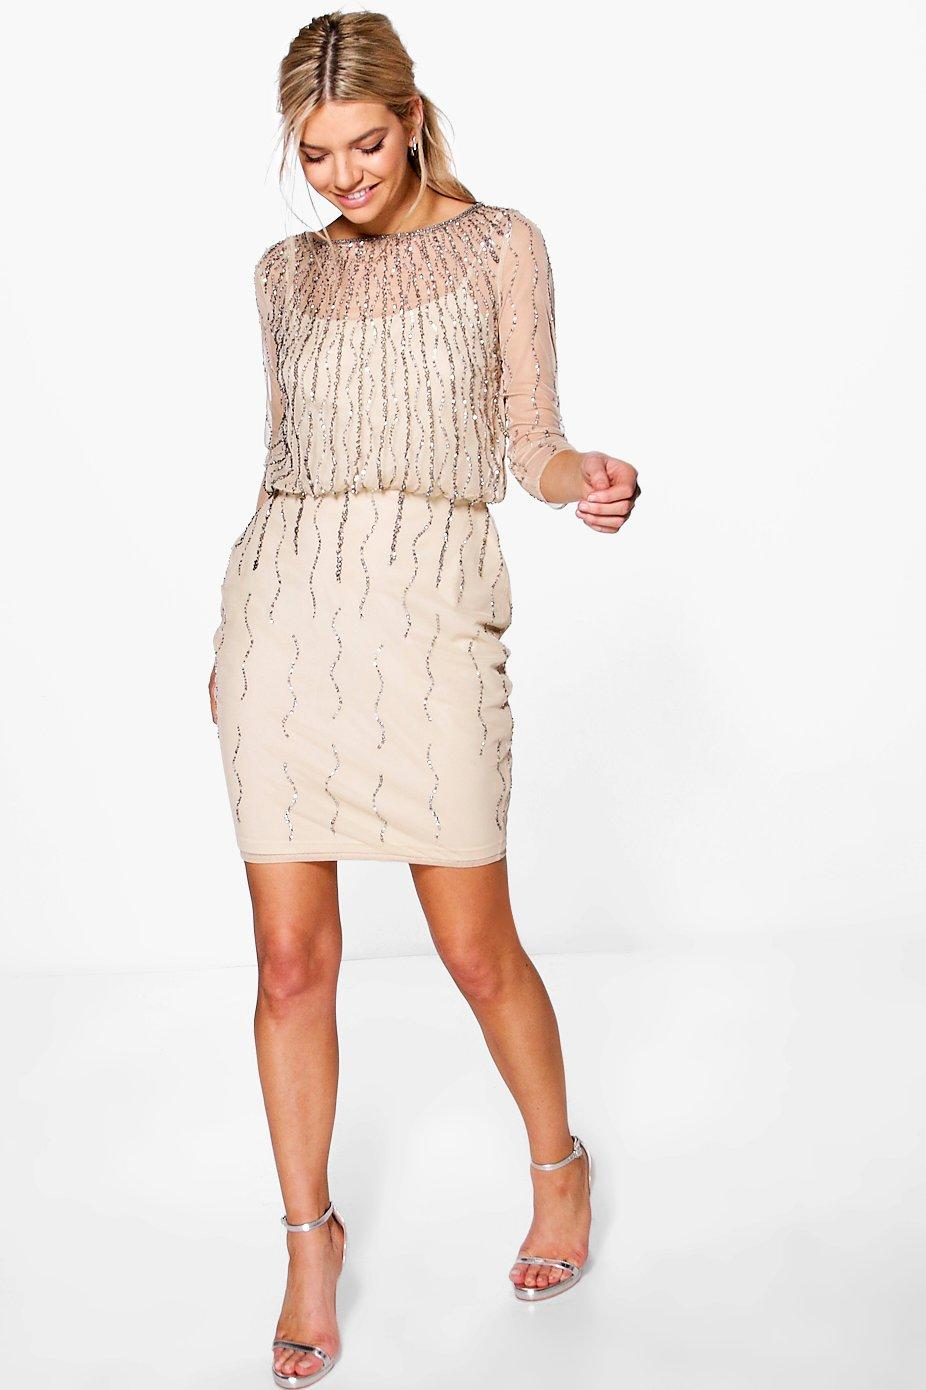 1920s Downton Abbey Dresses Boutique Marlena Beaded Batwing Dress blush $70.00 AT vintagedancer.com